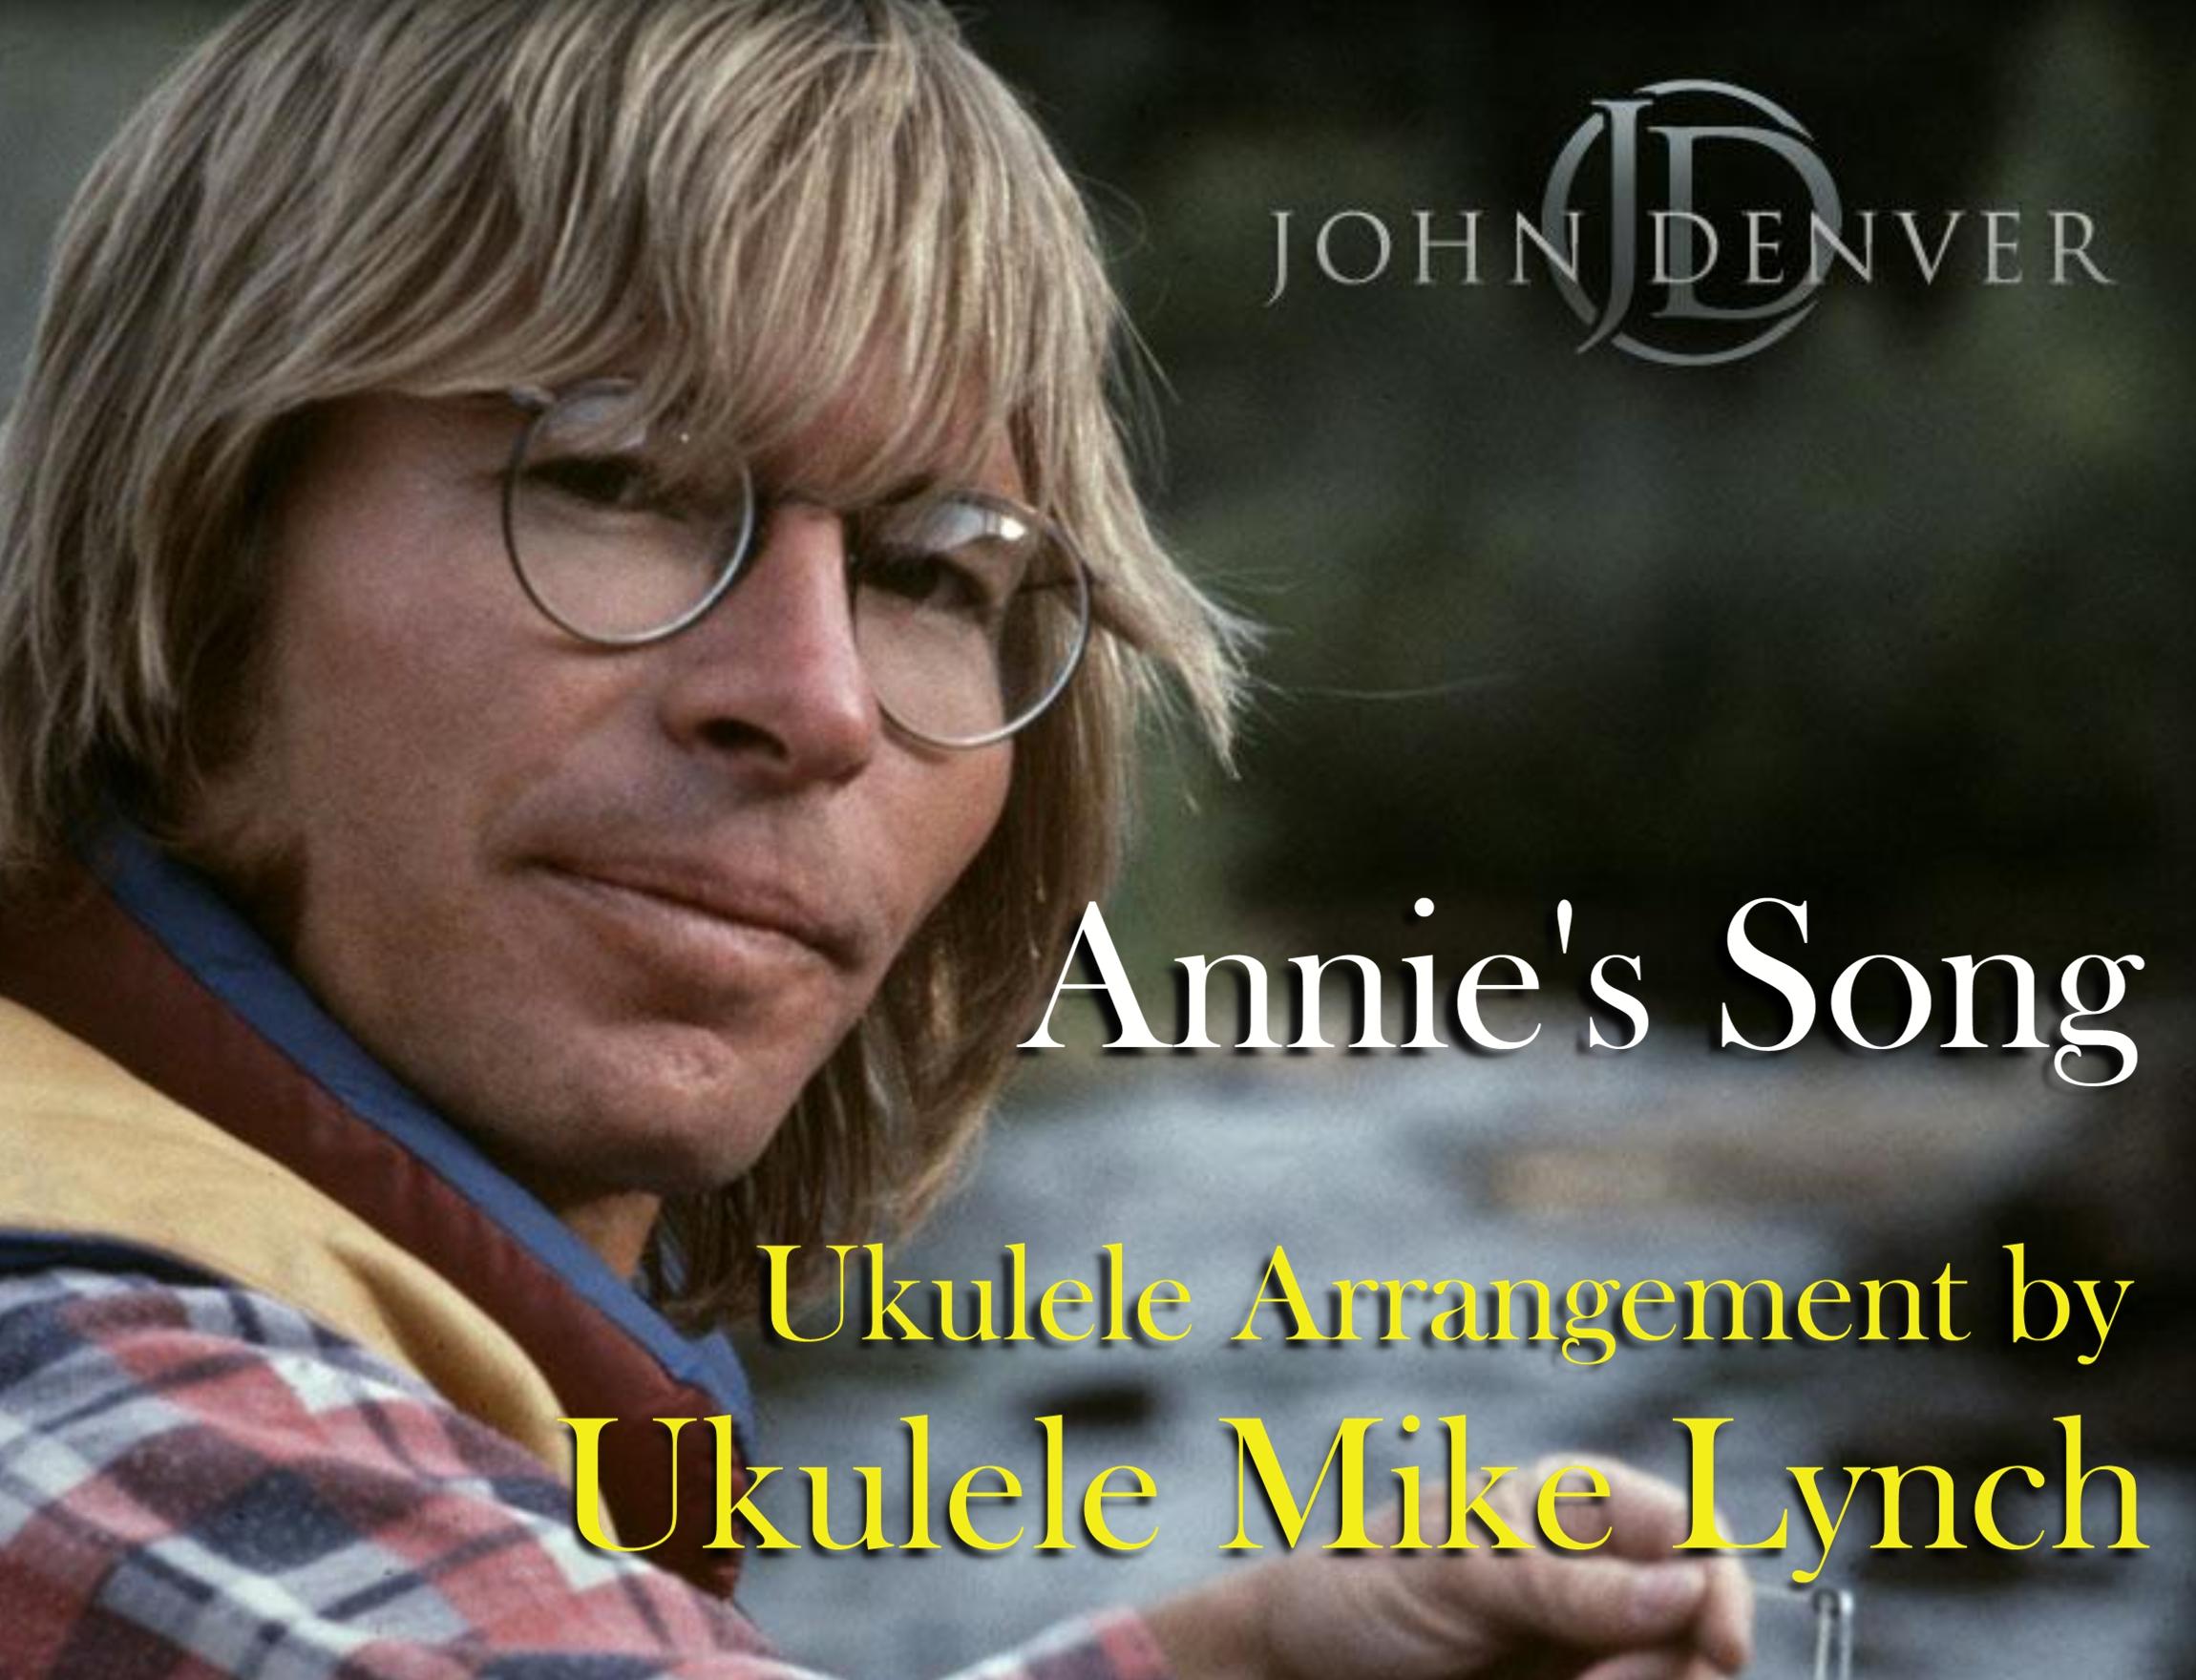 "ANNIE\'S SONG"" by John Denver – Ukulele solo arrangement by Ukulele ..."